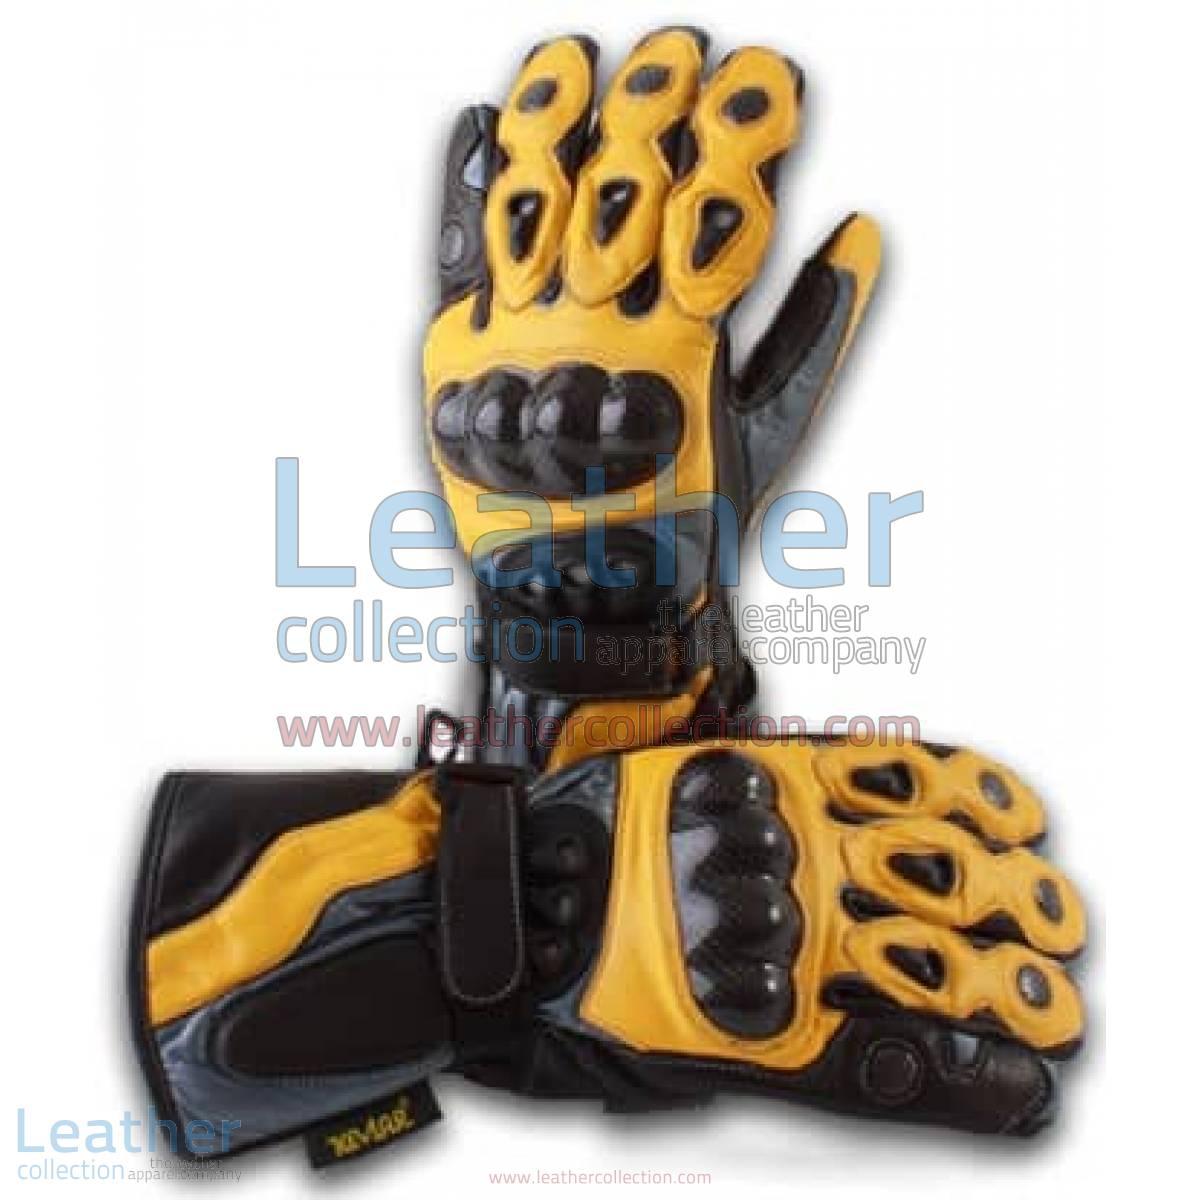 Scorpio Racer Gloves